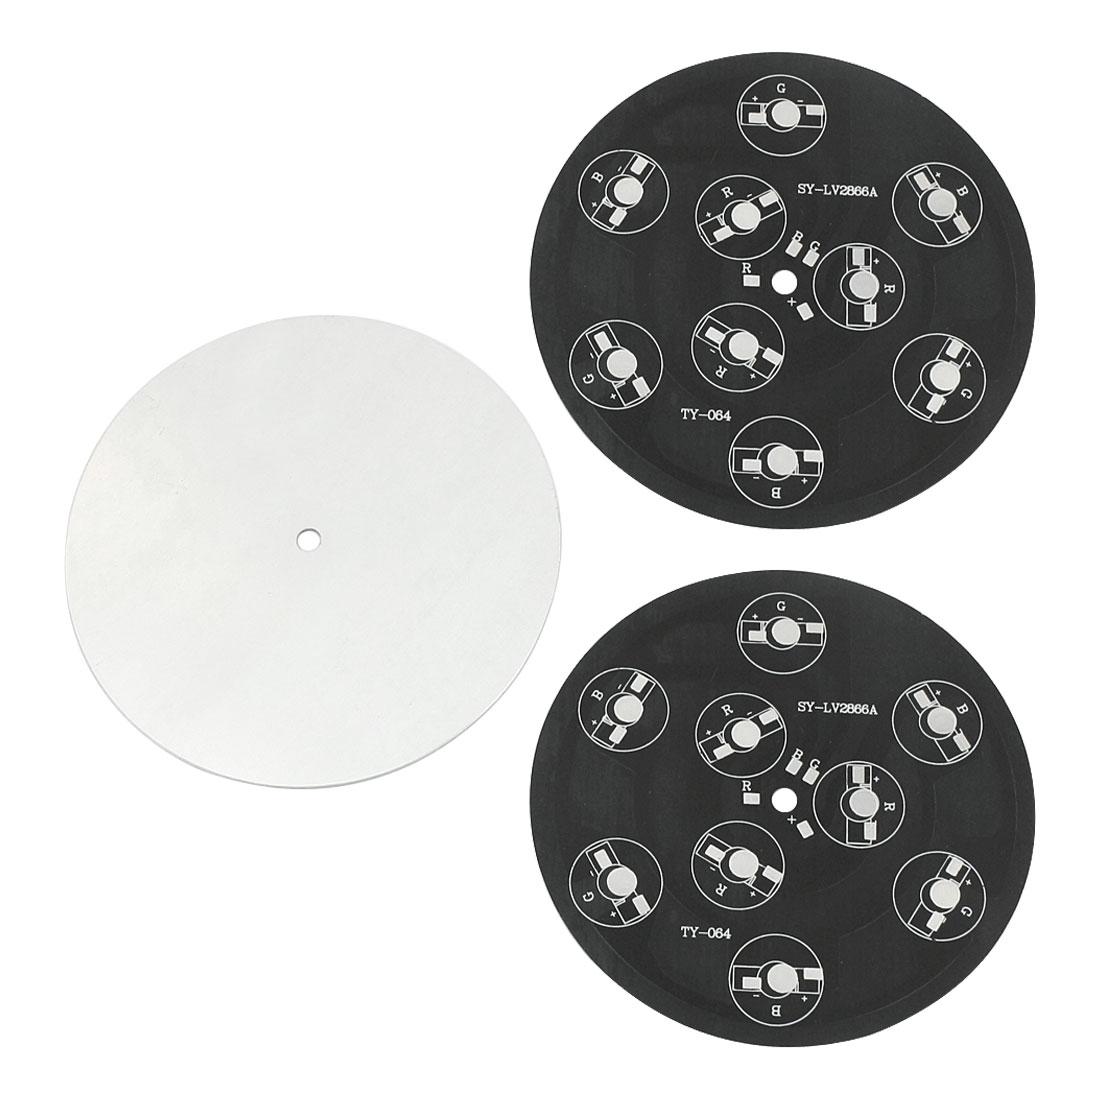 3 PCS 112mm Dia Round Aluminum PCB Circuit Board for 9 x 1W/3W/5W RGB LEDs Bulb Light